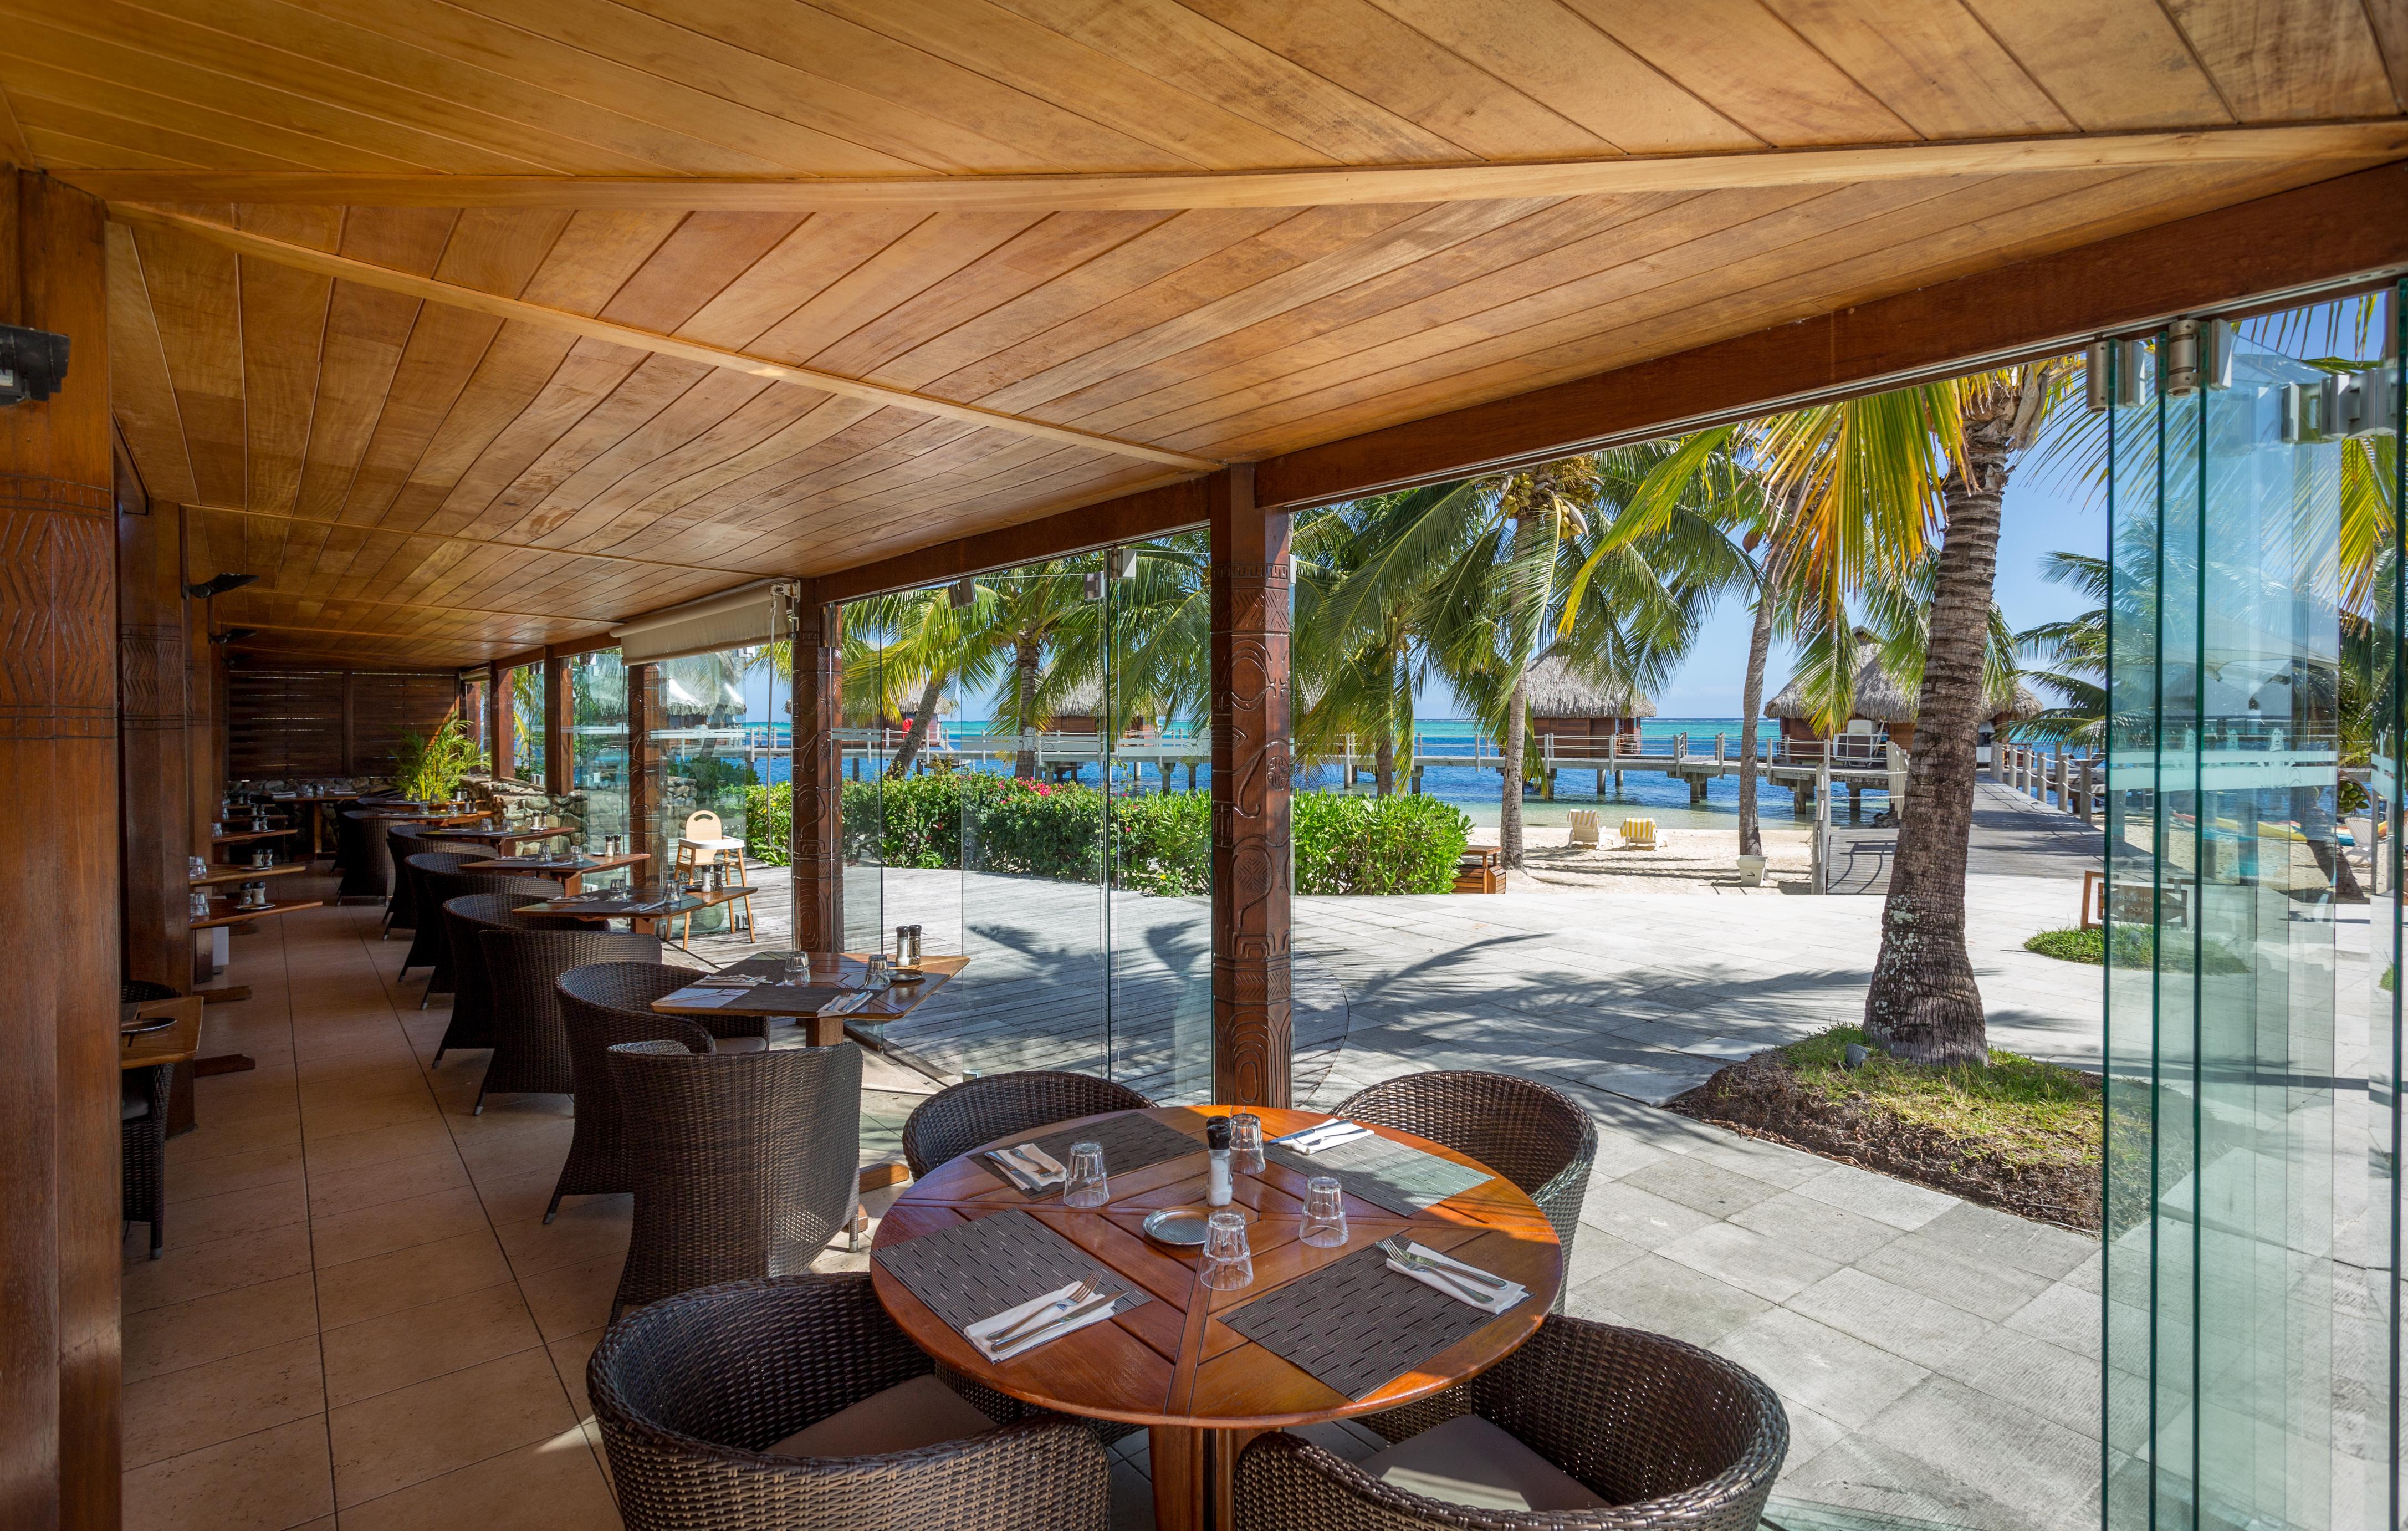 https://tahititourisme.com/wp-content/uploads/2018/03/RESTAURATION-Restaurant-Mahanai-1-Charles_Veronese.jpg